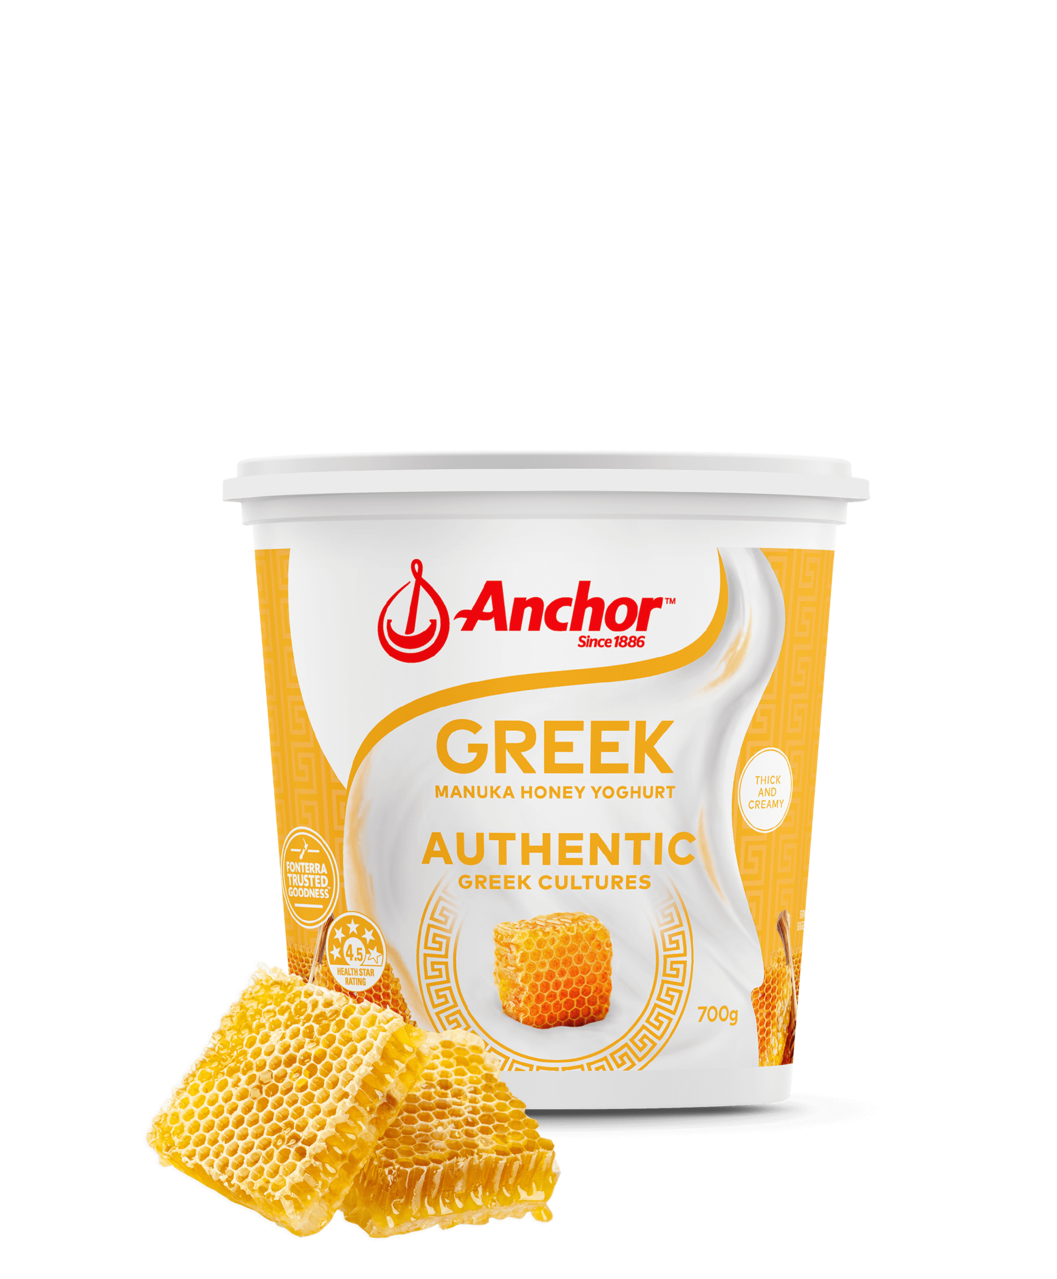 Anchor Protein+ Manuka Honey Yoghurt 950g pack